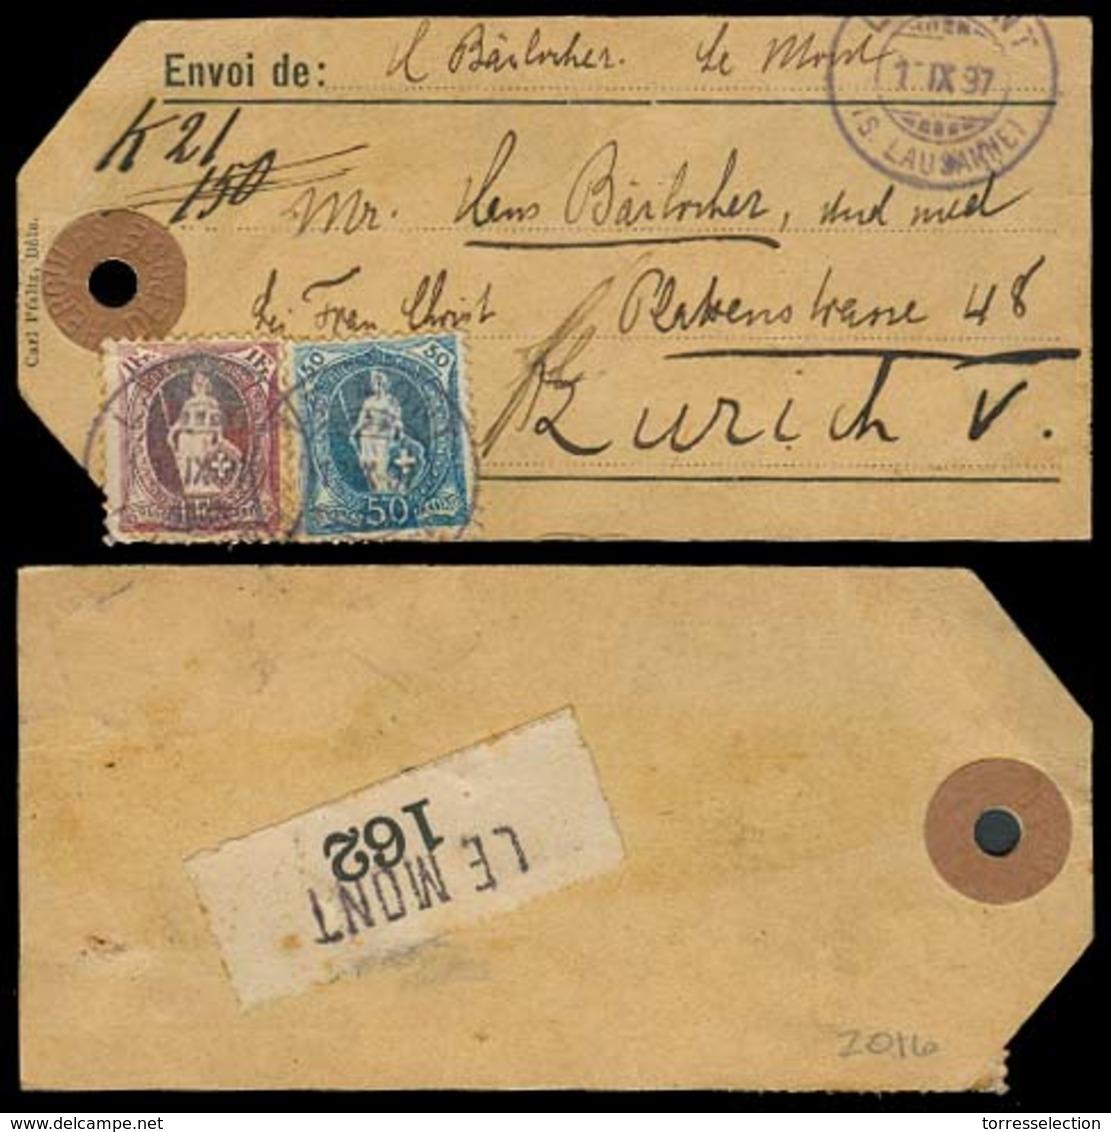 SWITZERLAND. 1897. Le Mont - Zurich. Tag Baj Reg Fkd 50c 1 Fr (the Best One). Tied Cds. Fine. - Unclassified